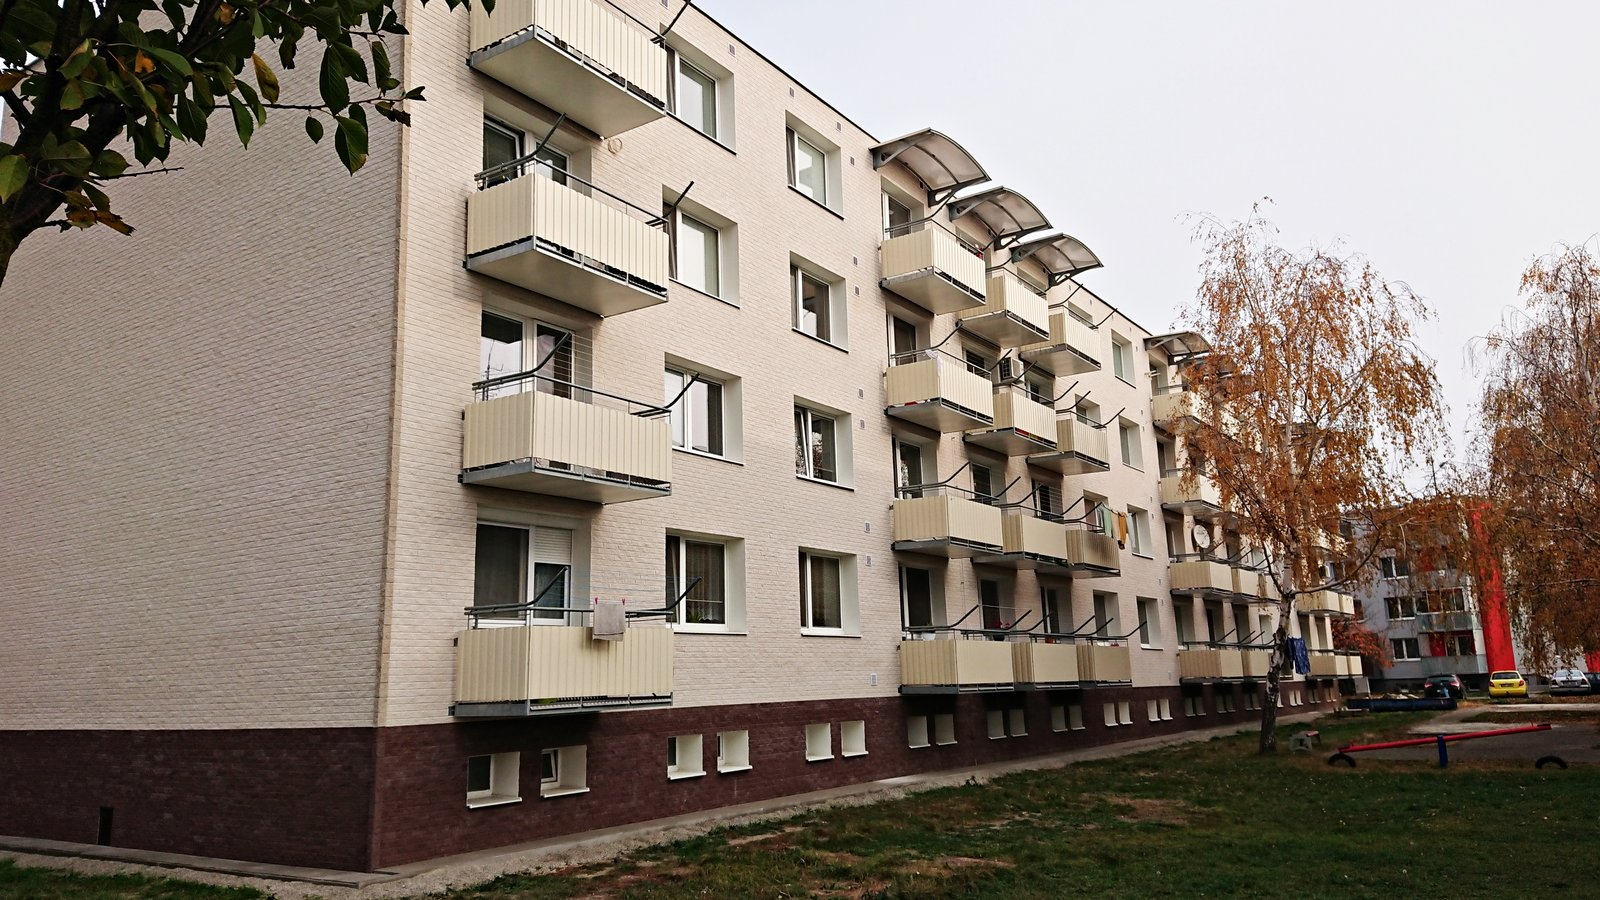 Lifebrick fasáda - Břeclav